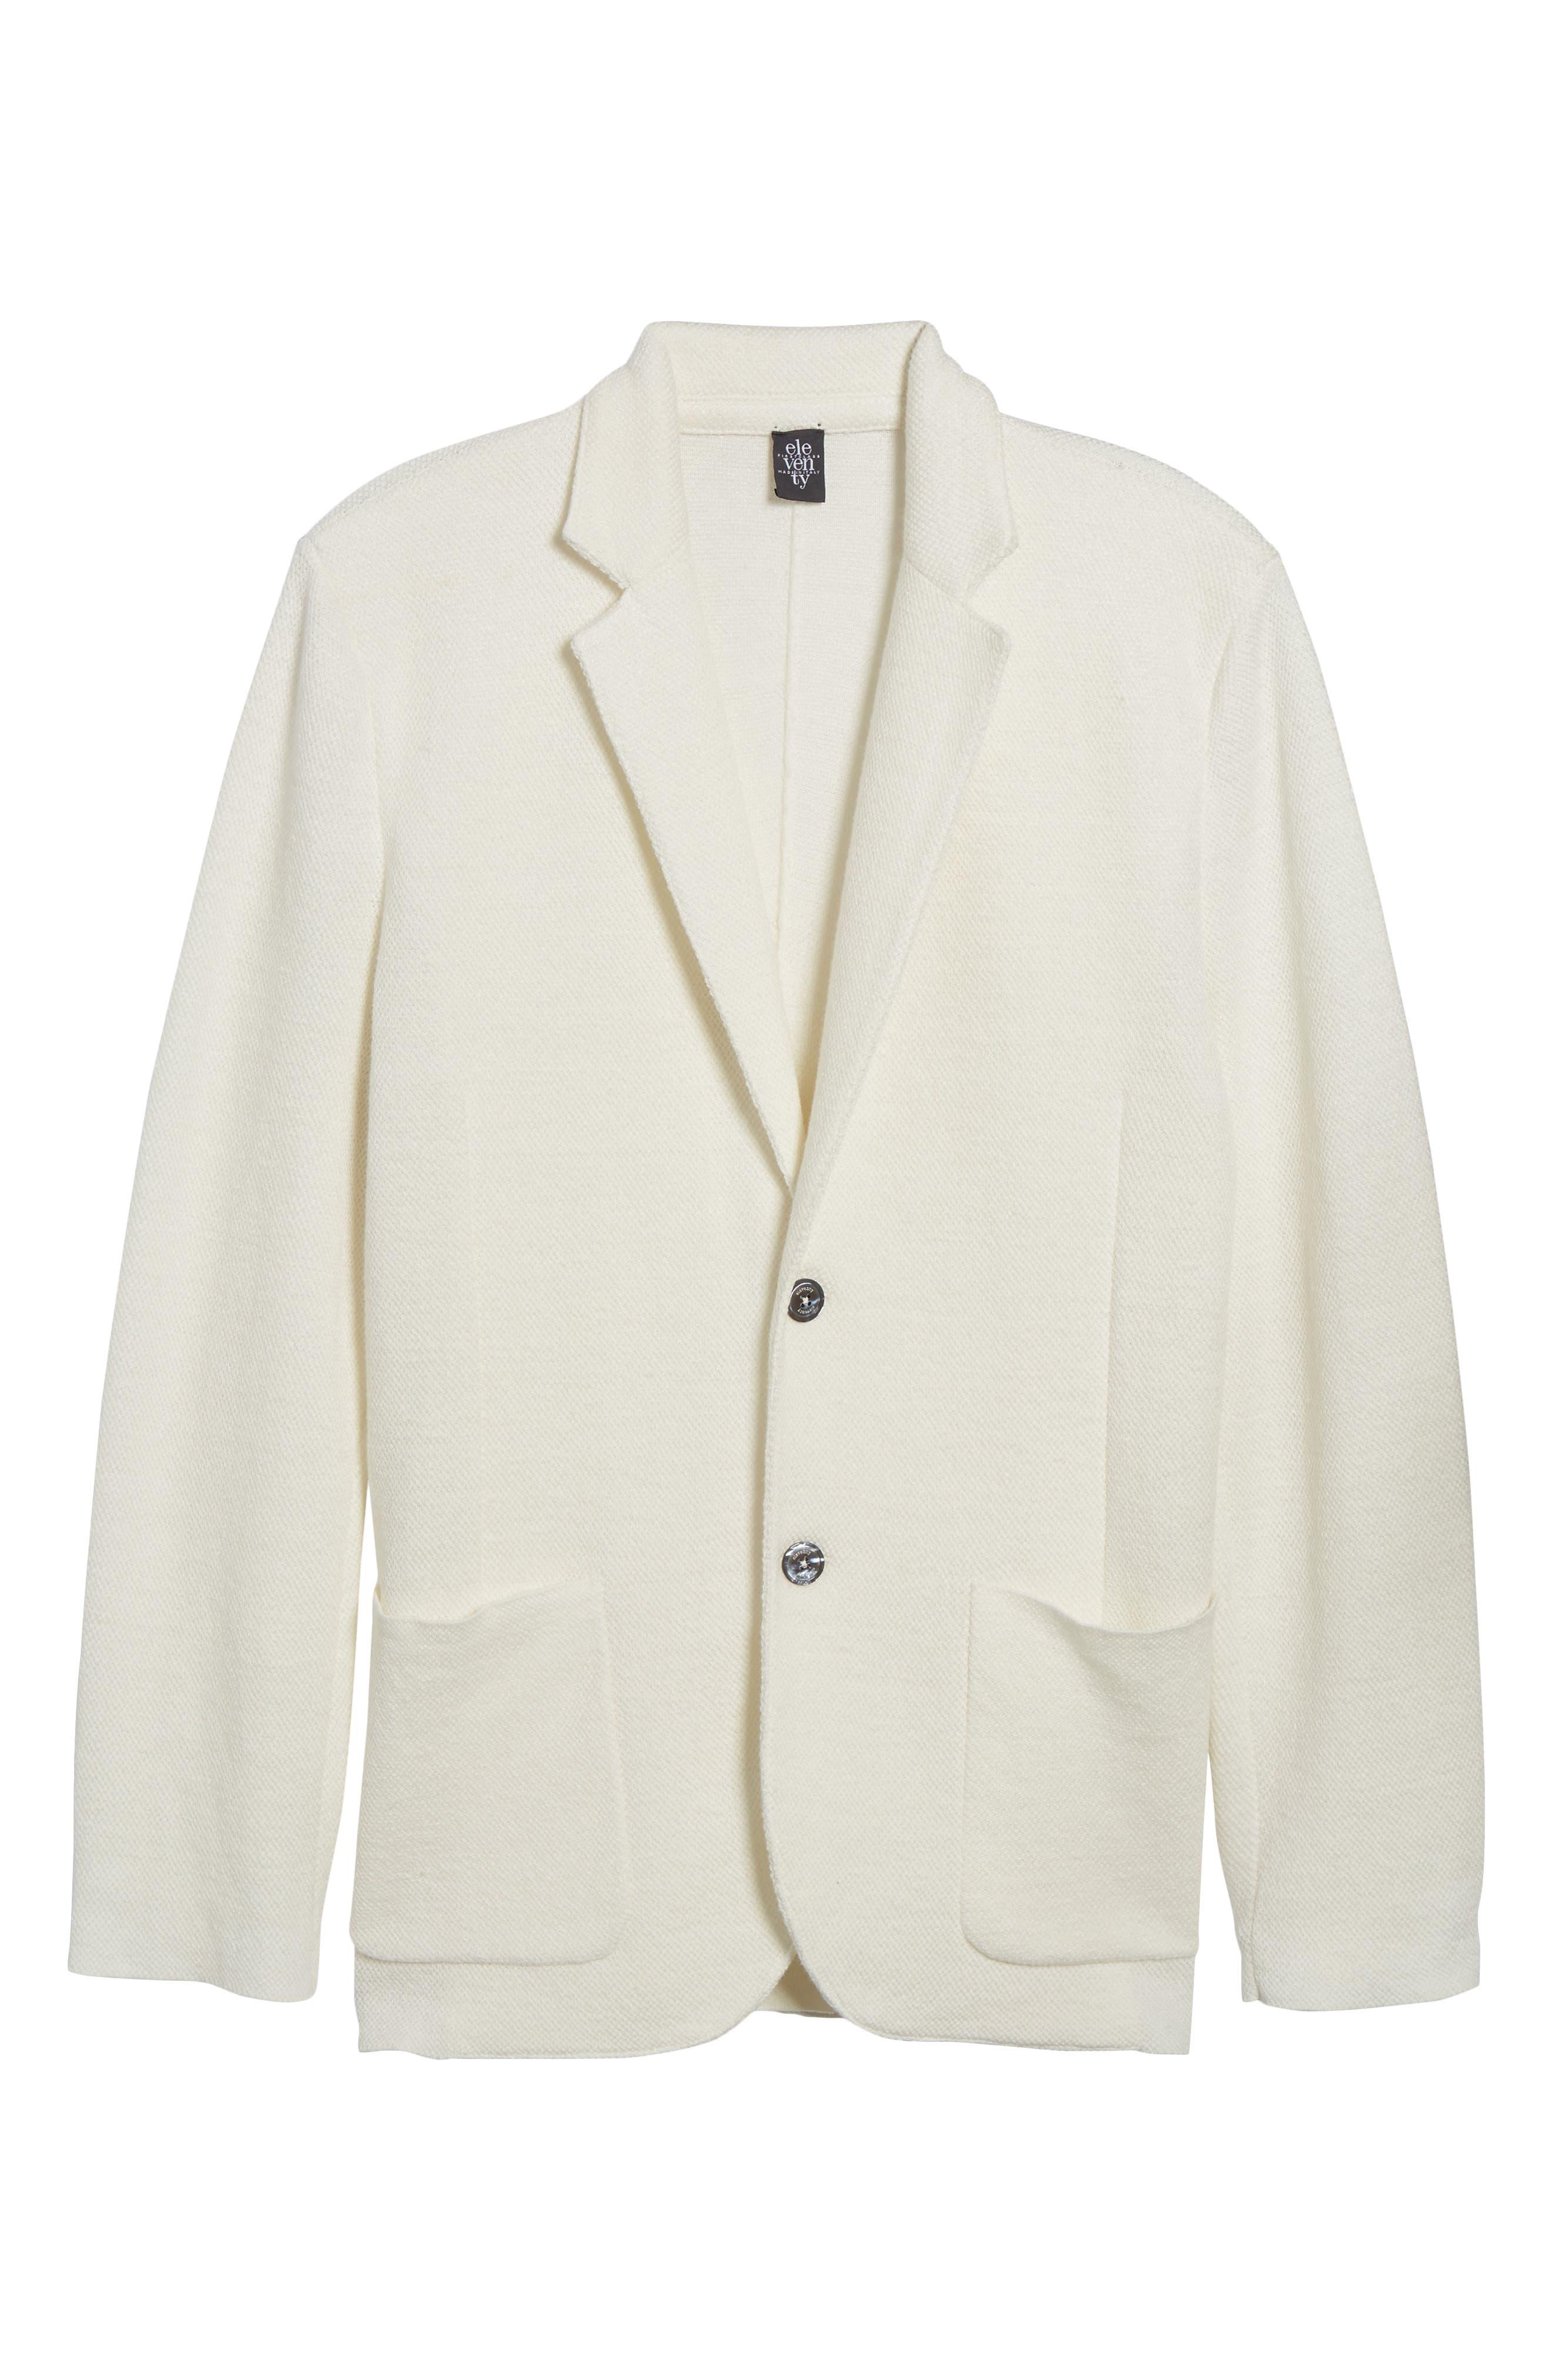 Slim Fit Linen Blend Sweater Jacket,                             Alternate thumbnail 6, color,                             102